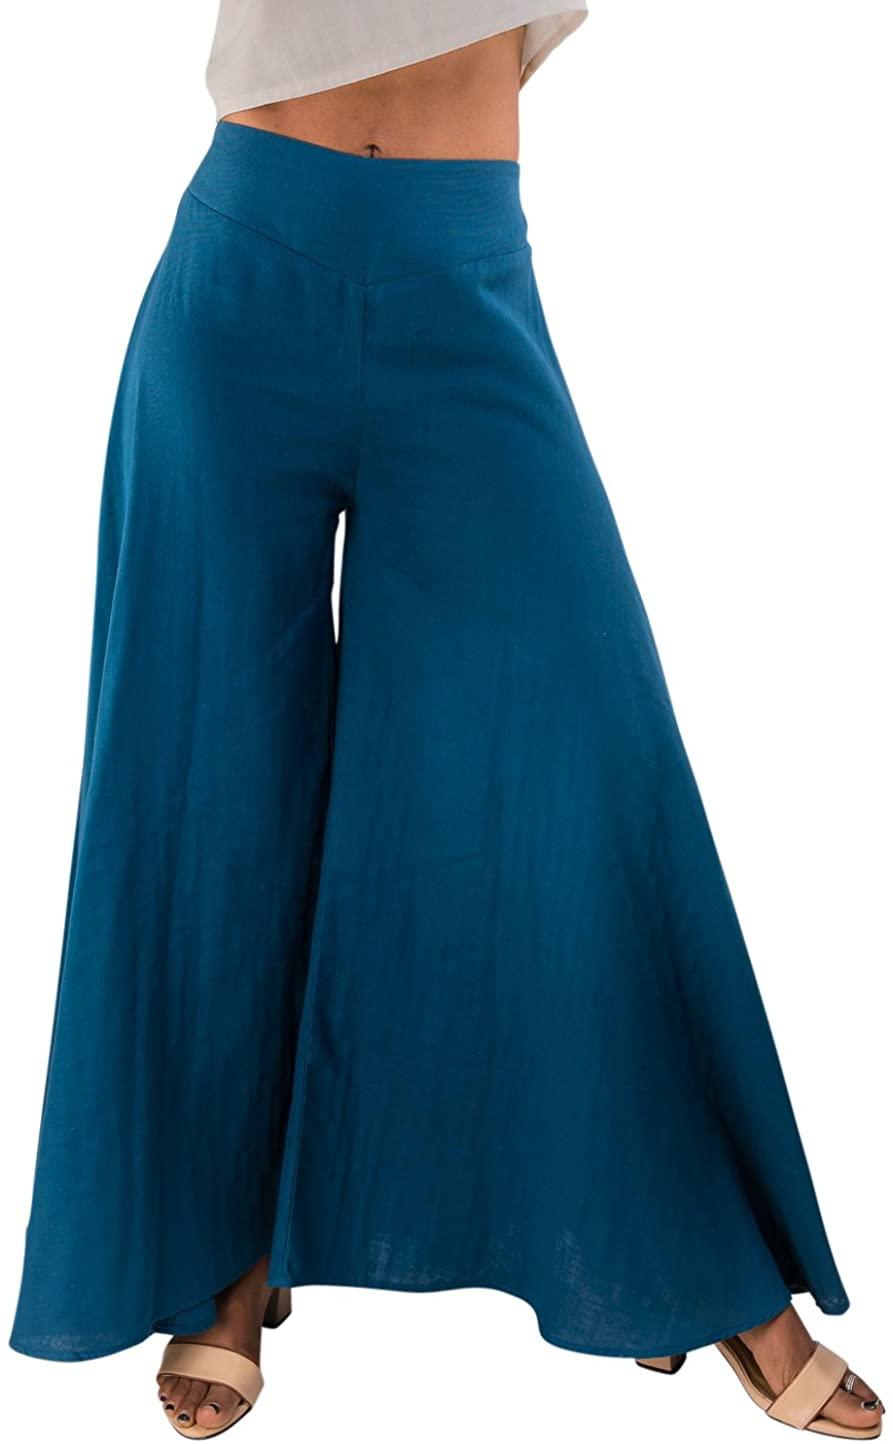 Tropic Bliss Wide Leg Organic Cotton Palazzo Pants for Women, Casual Bohemian Style Skirt Pant at Amazon Women's Clothing store